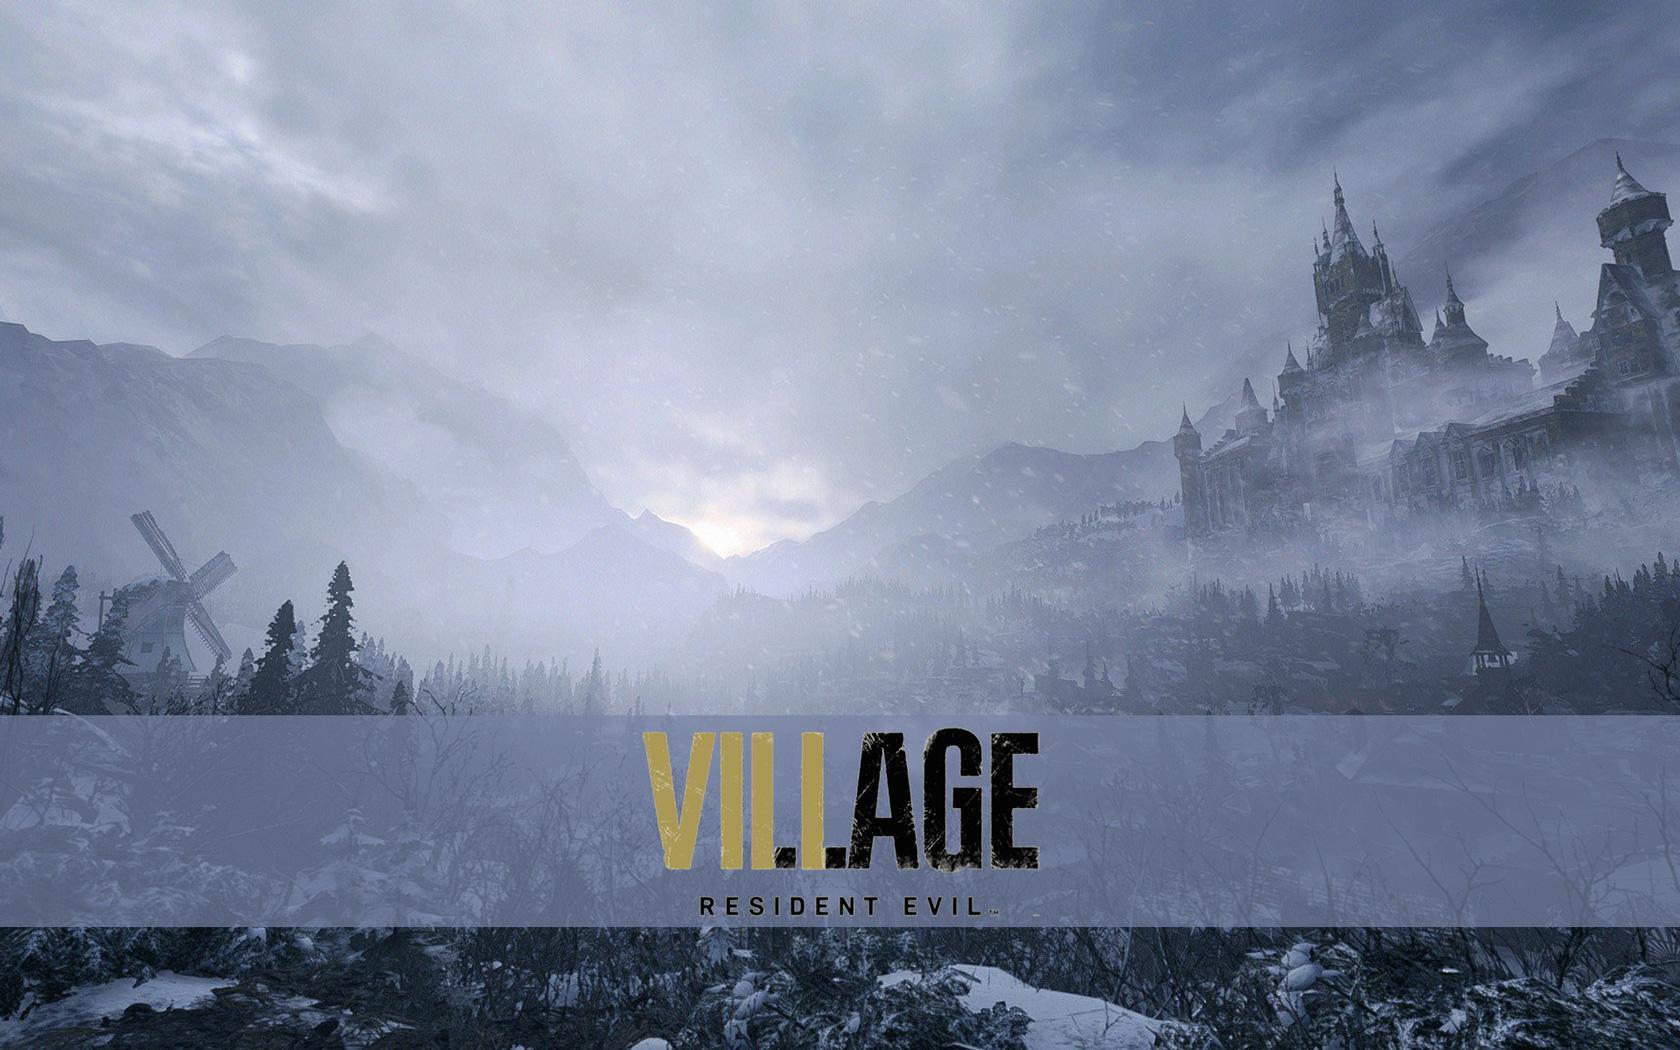 Free Resident Evil Village Wallpaper in 1680x1050